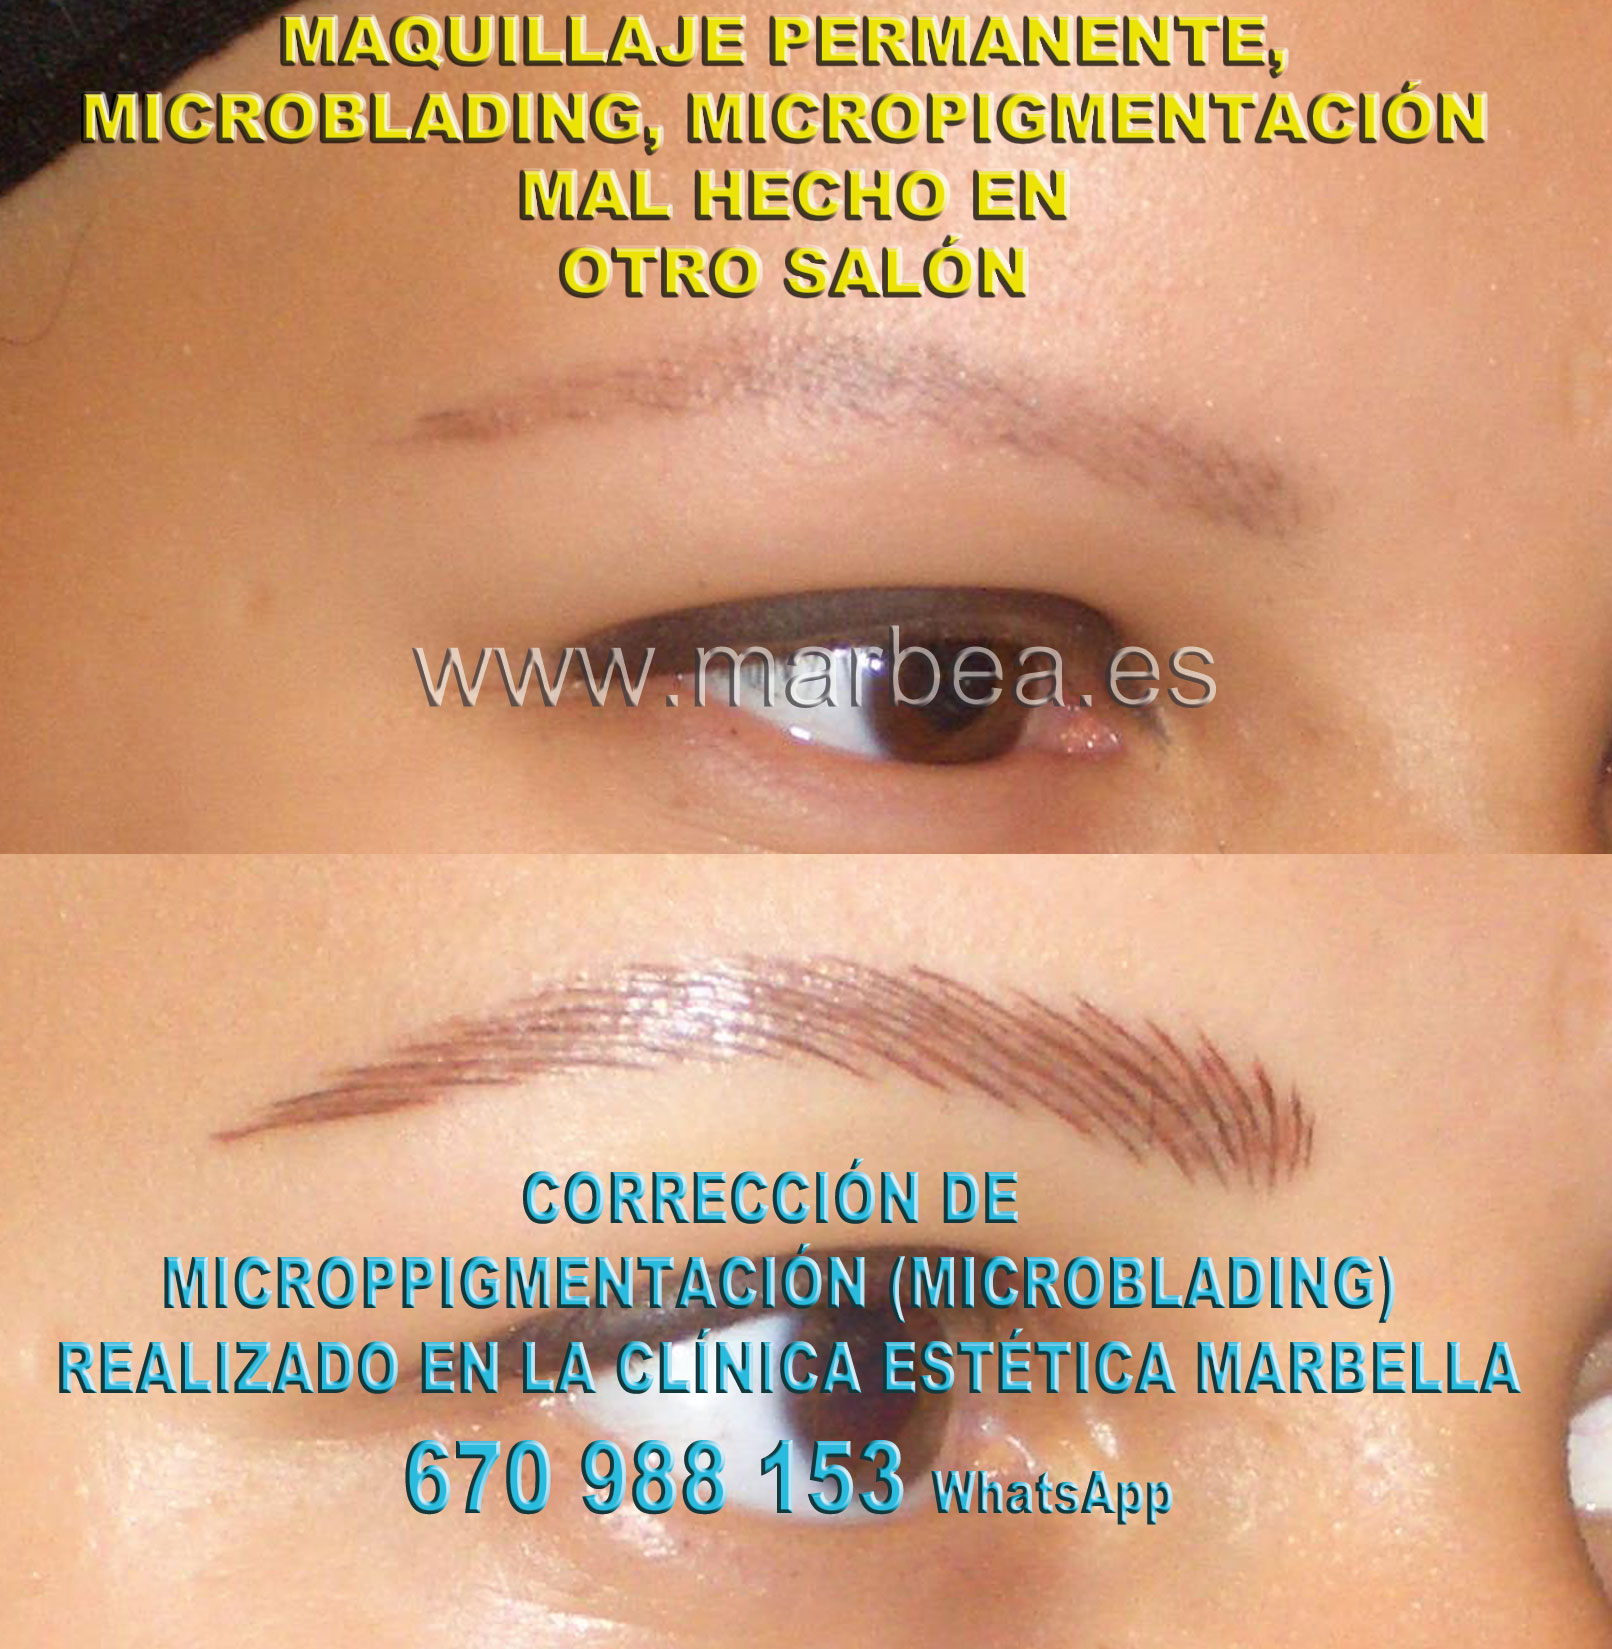 QUITAR TATUAJE CEJAS clínica estética delineados entrega corrección de micropigmentación en cejas,corregir micropigmentación mal hecha